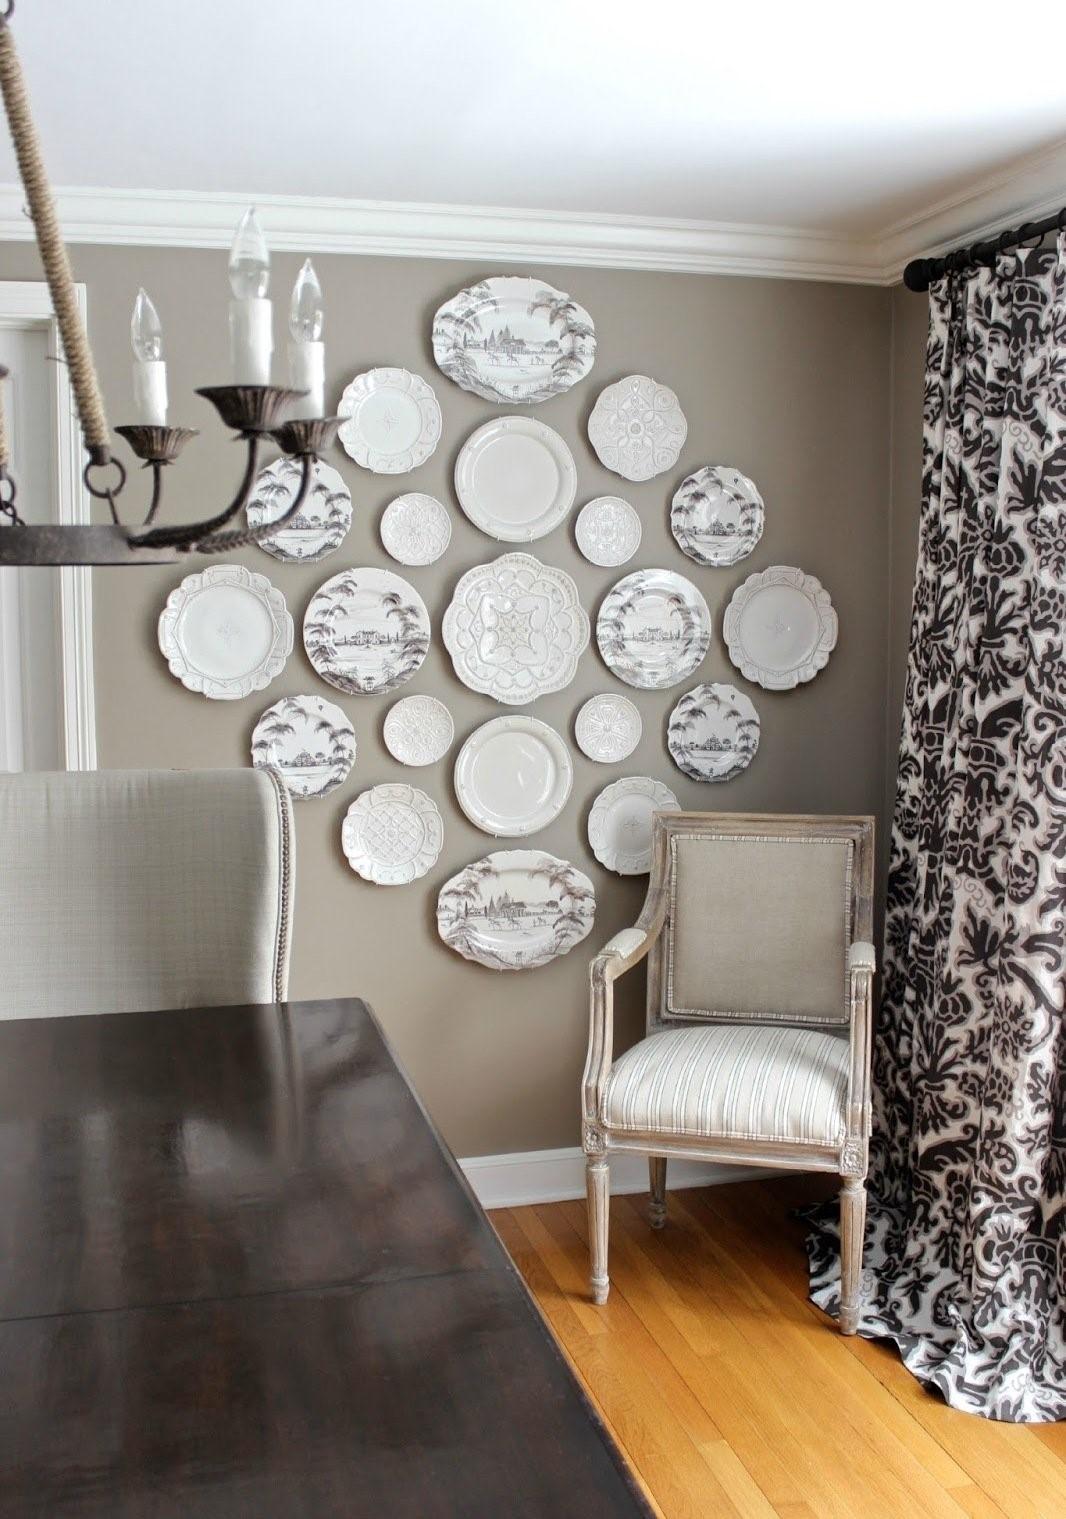 5. Plate Decoration via Simphome